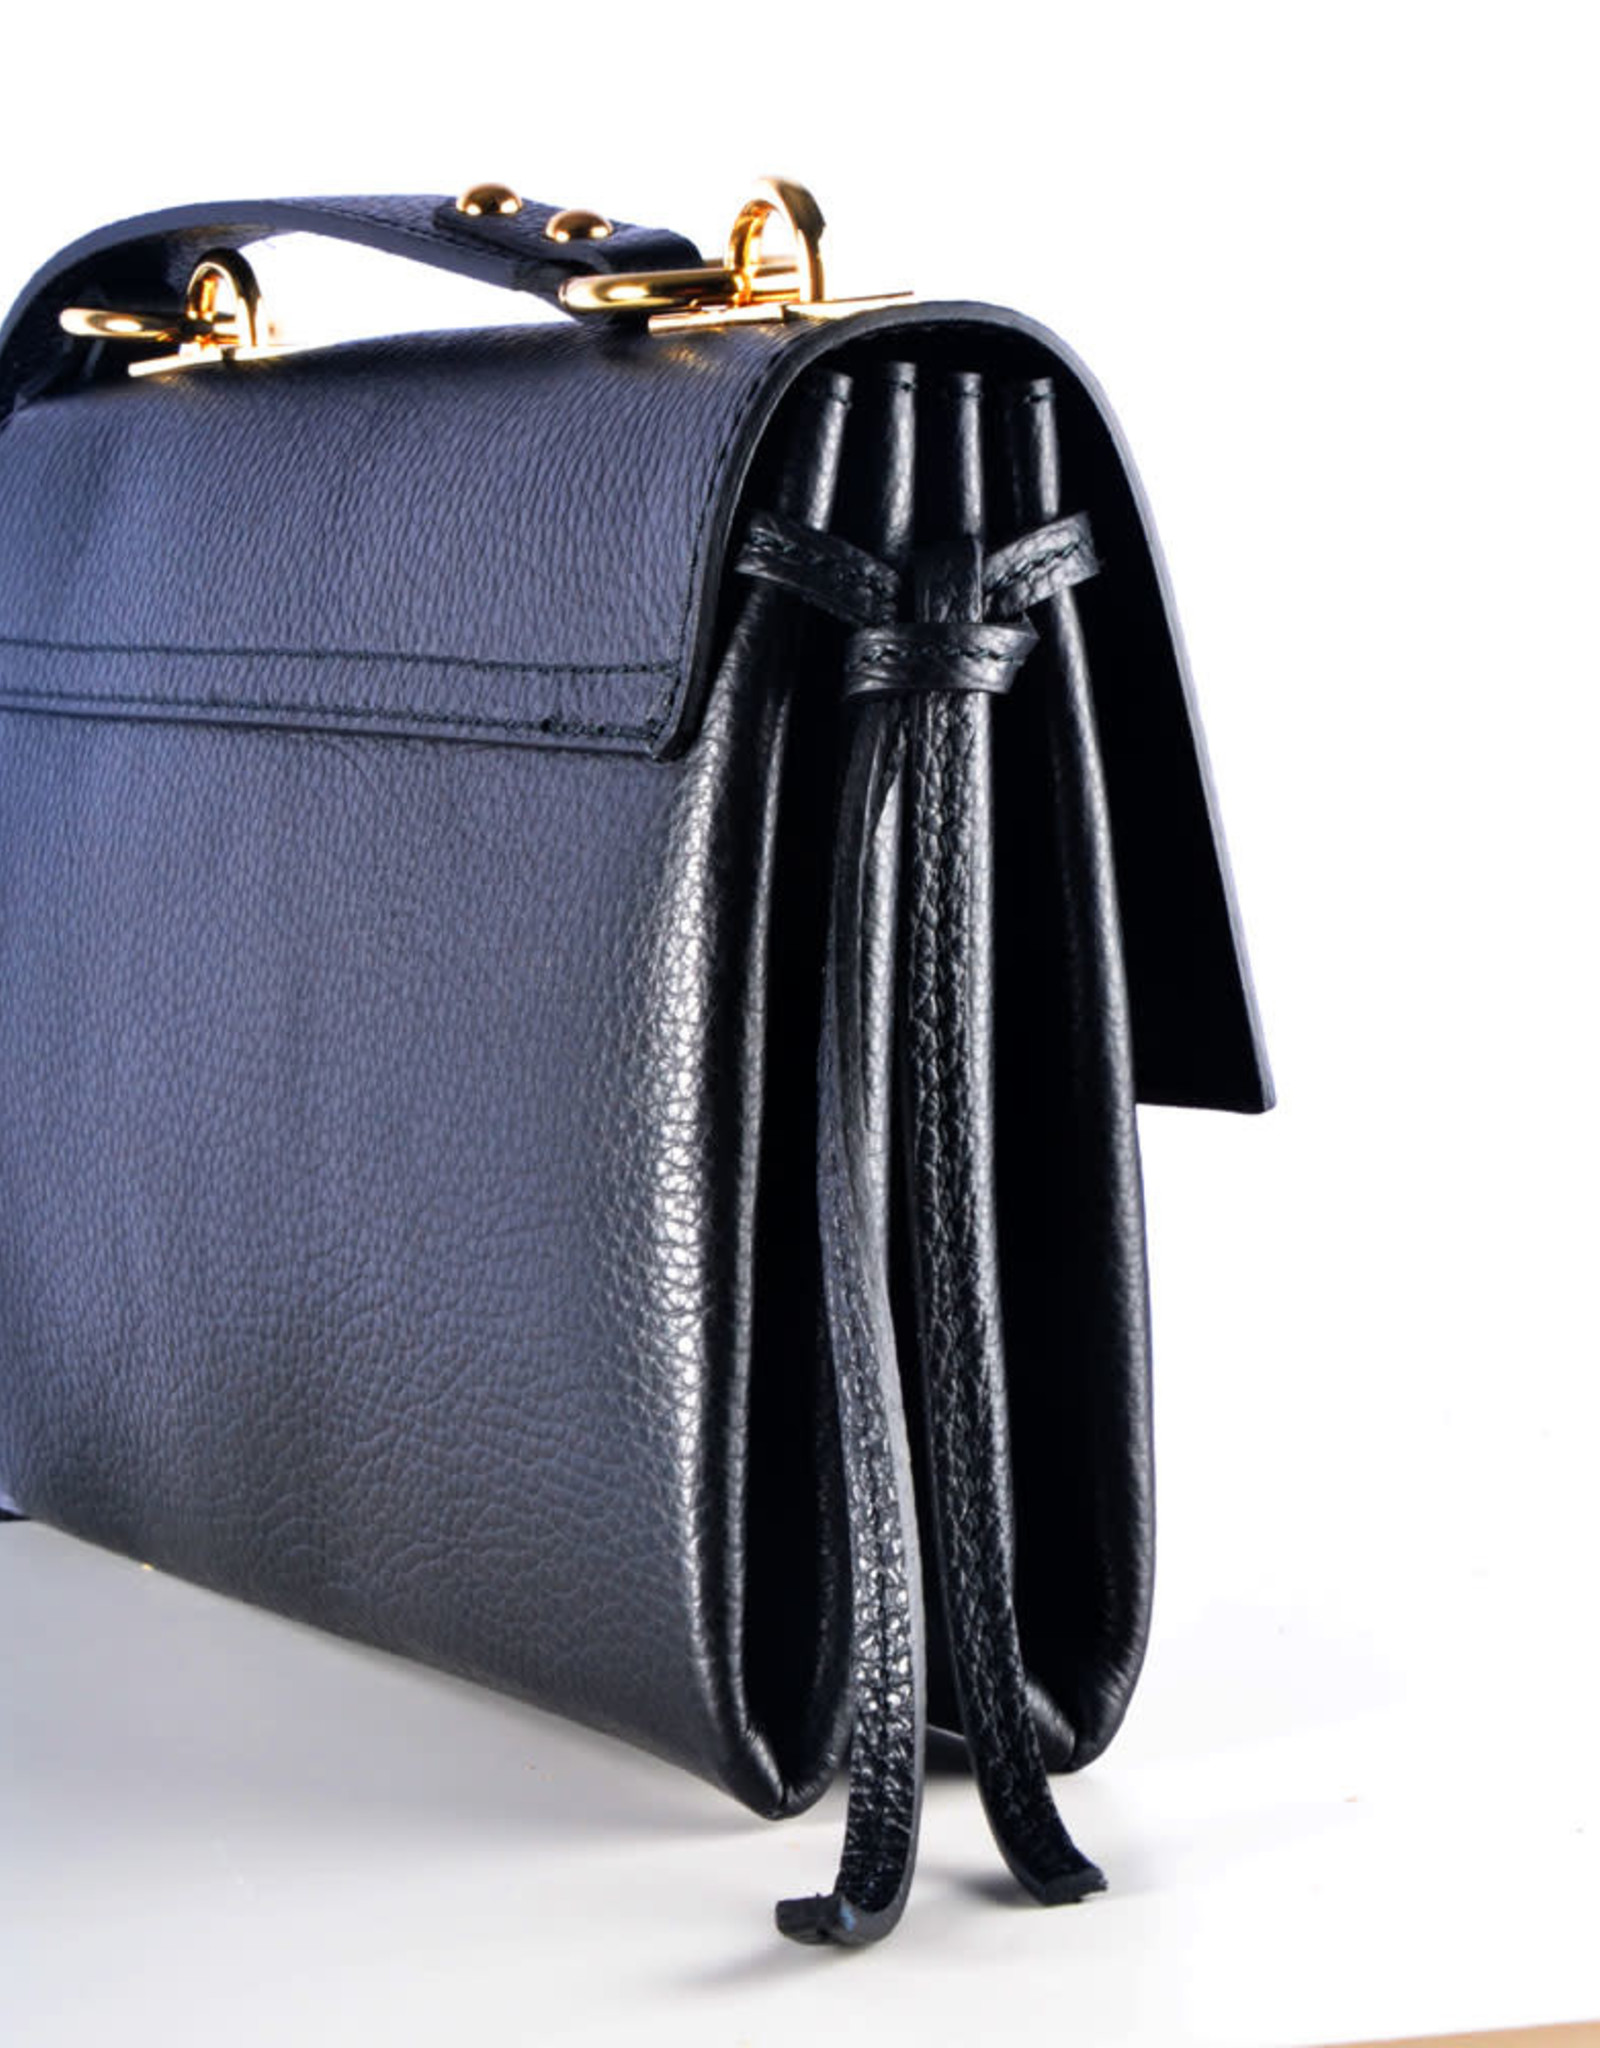 Black stone bag